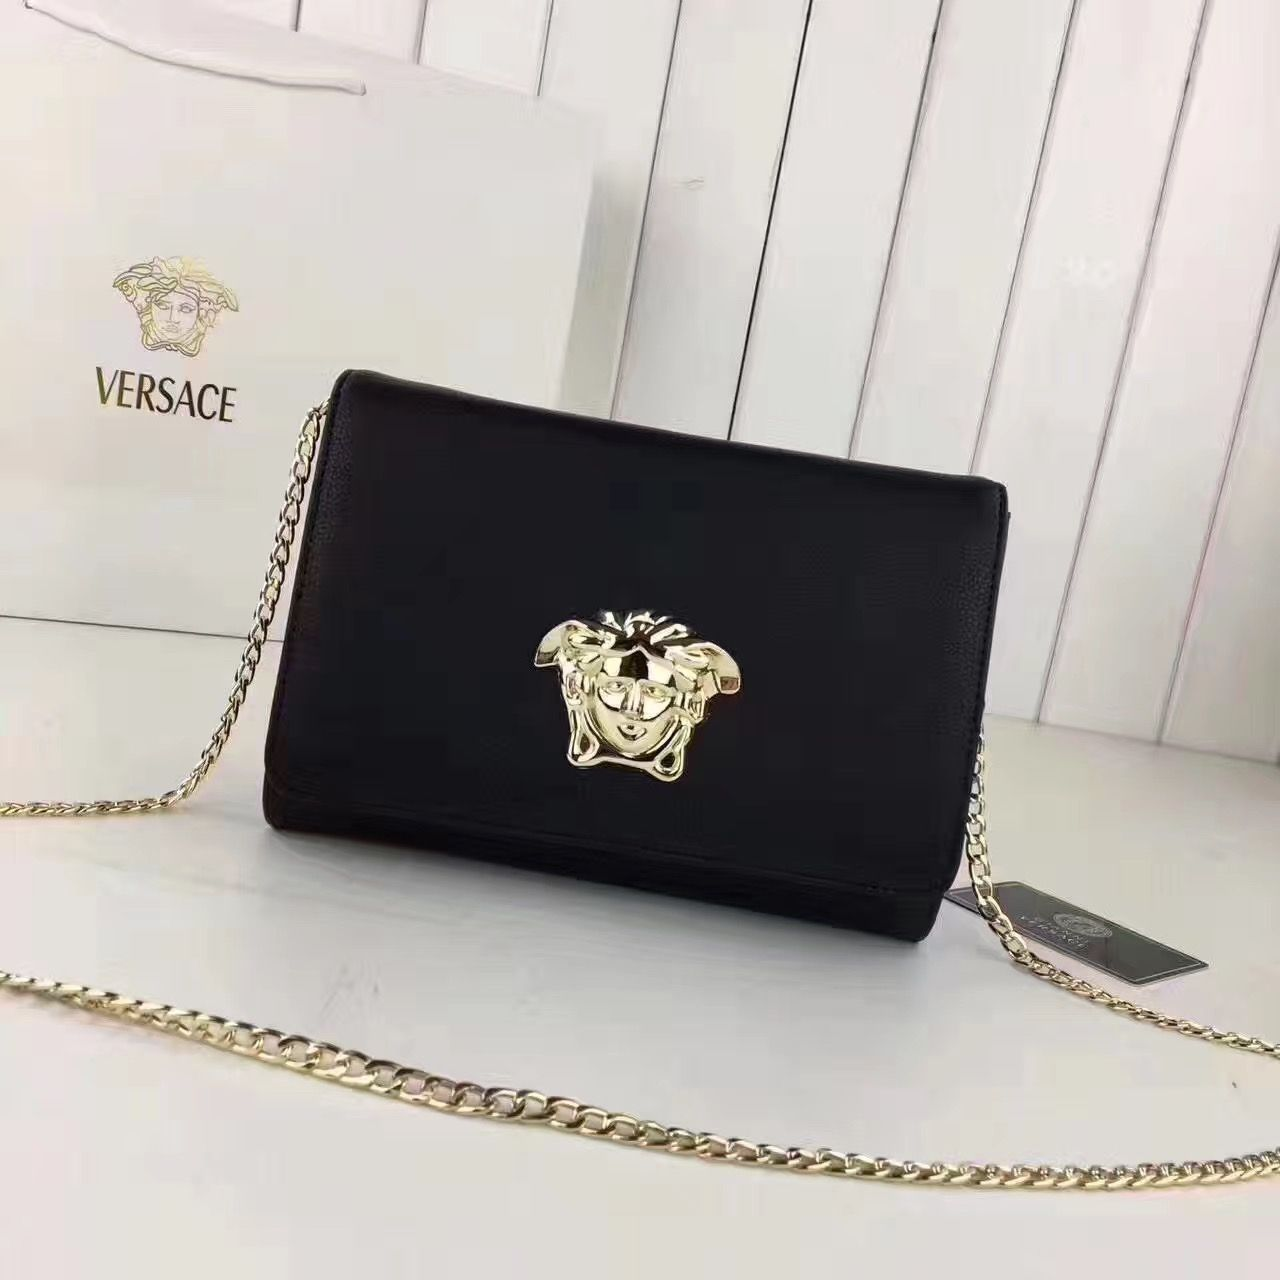 3b5002968d0 Versace Medusa Head Evening Clutch Bag 100% Authentic   Versace ...